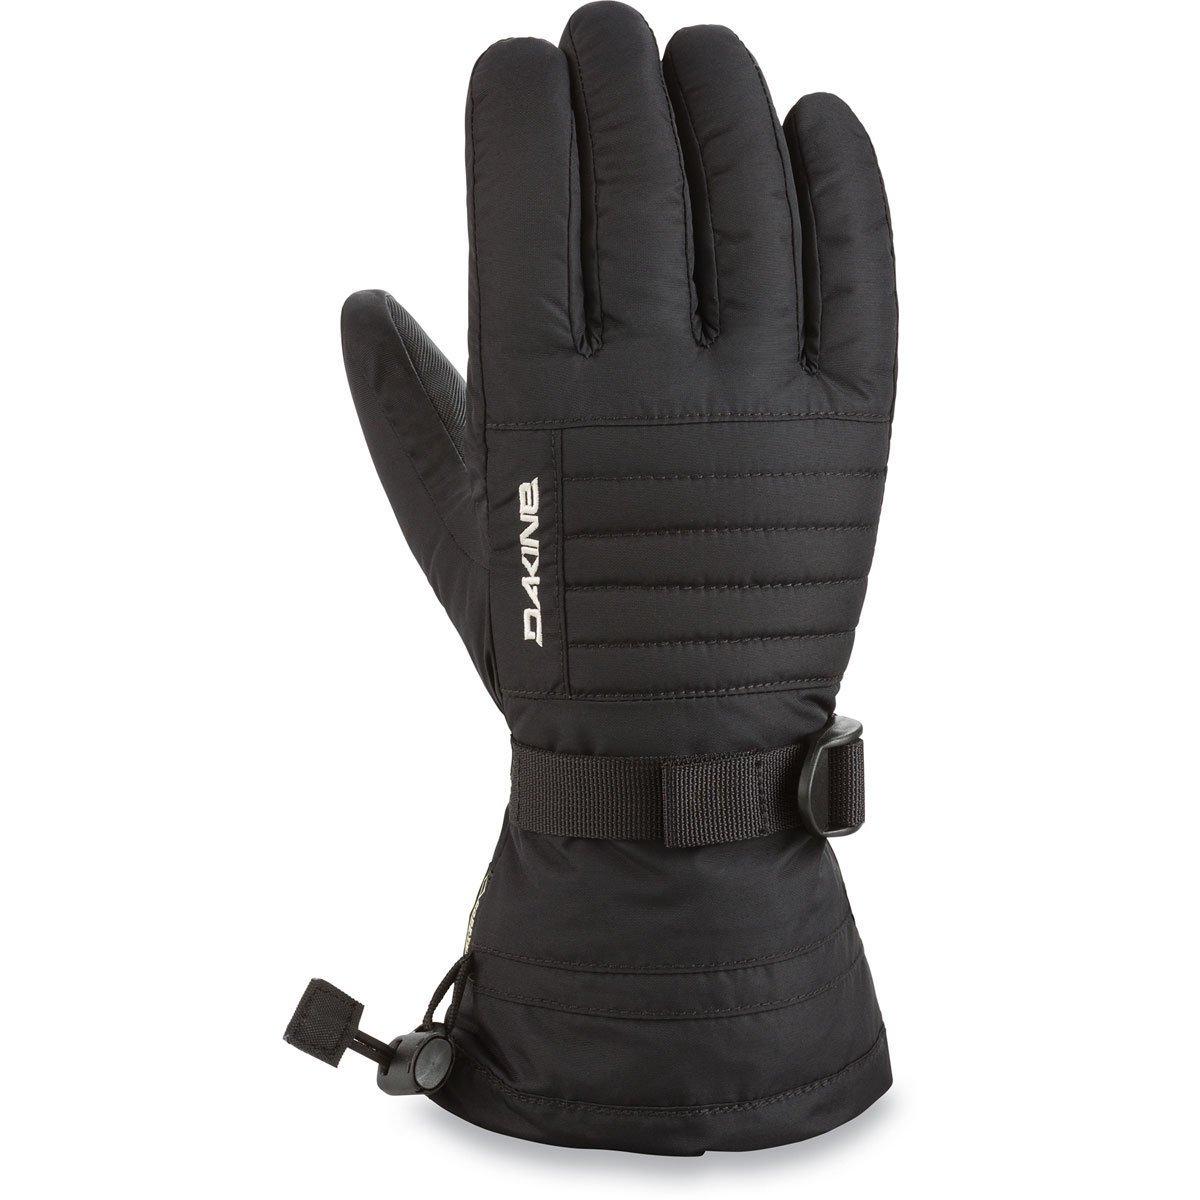 Dakine Omni Gore Glove